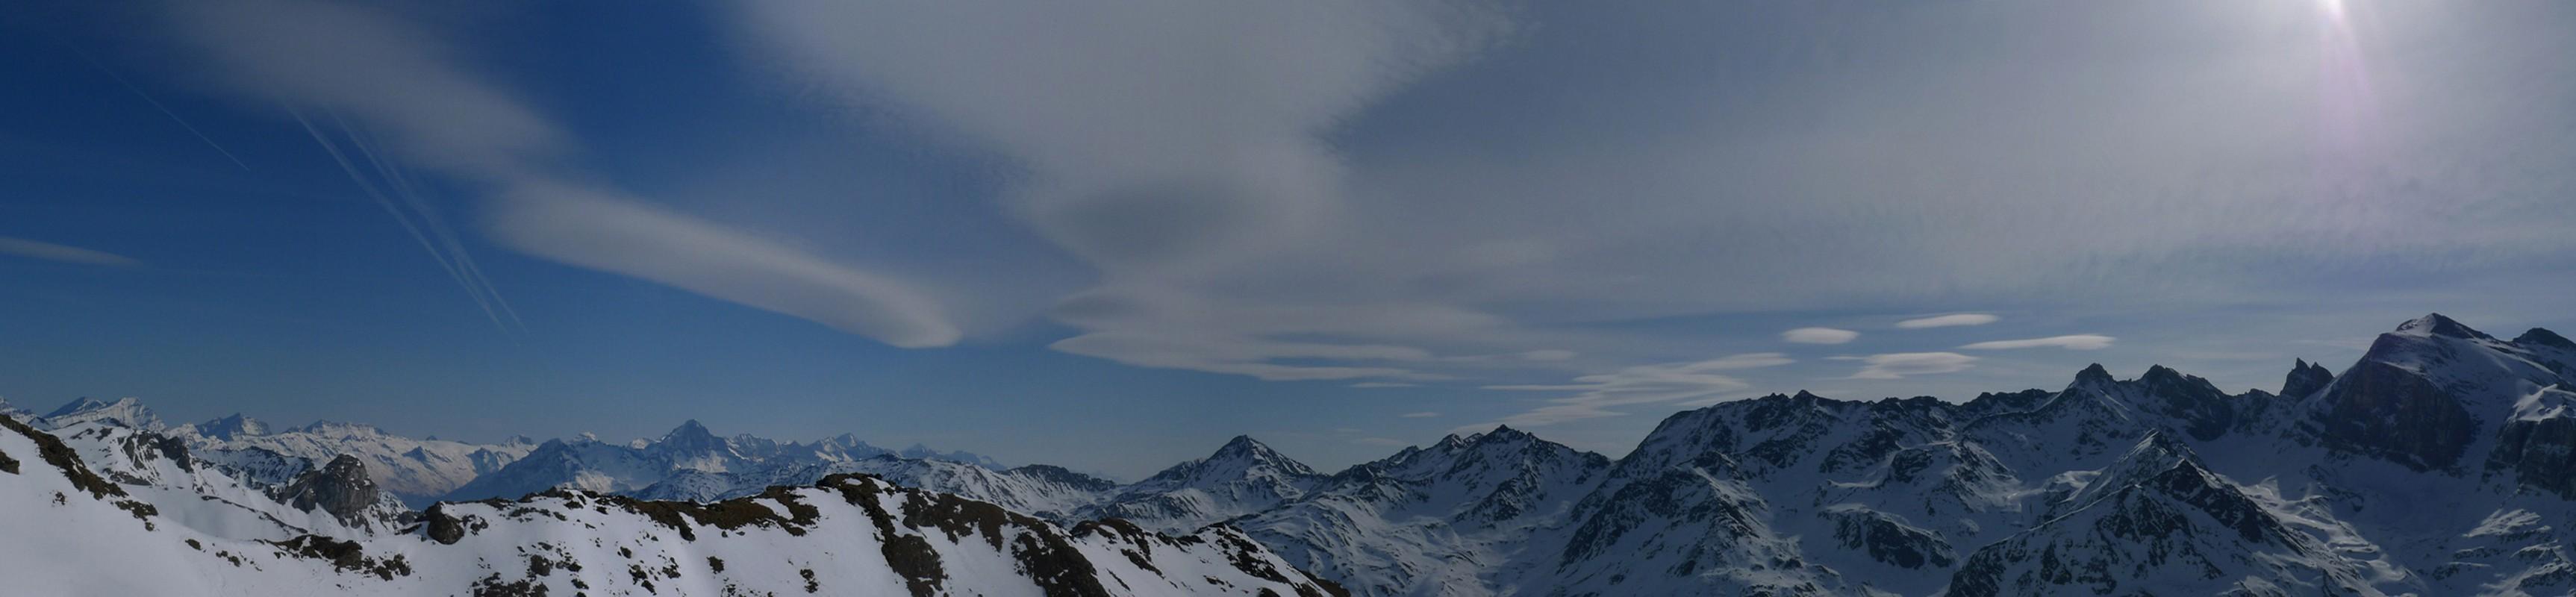 Turtmannhütte / Cabane Tourtemagne  Walliser Alpen / Alpes valaisannes Švýcarsko panorama 10